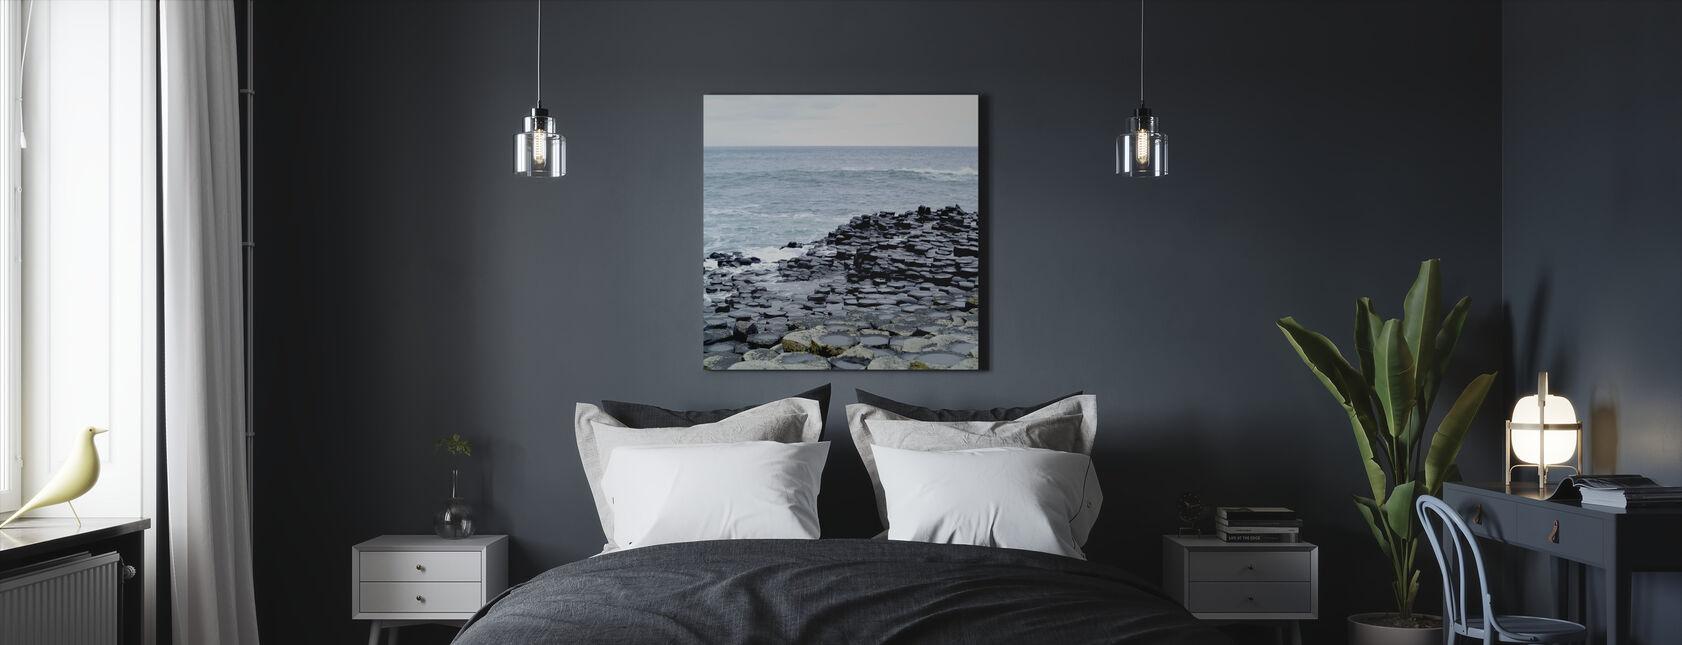 Giants Causeway in Antrim - Canvas print - Bedroom